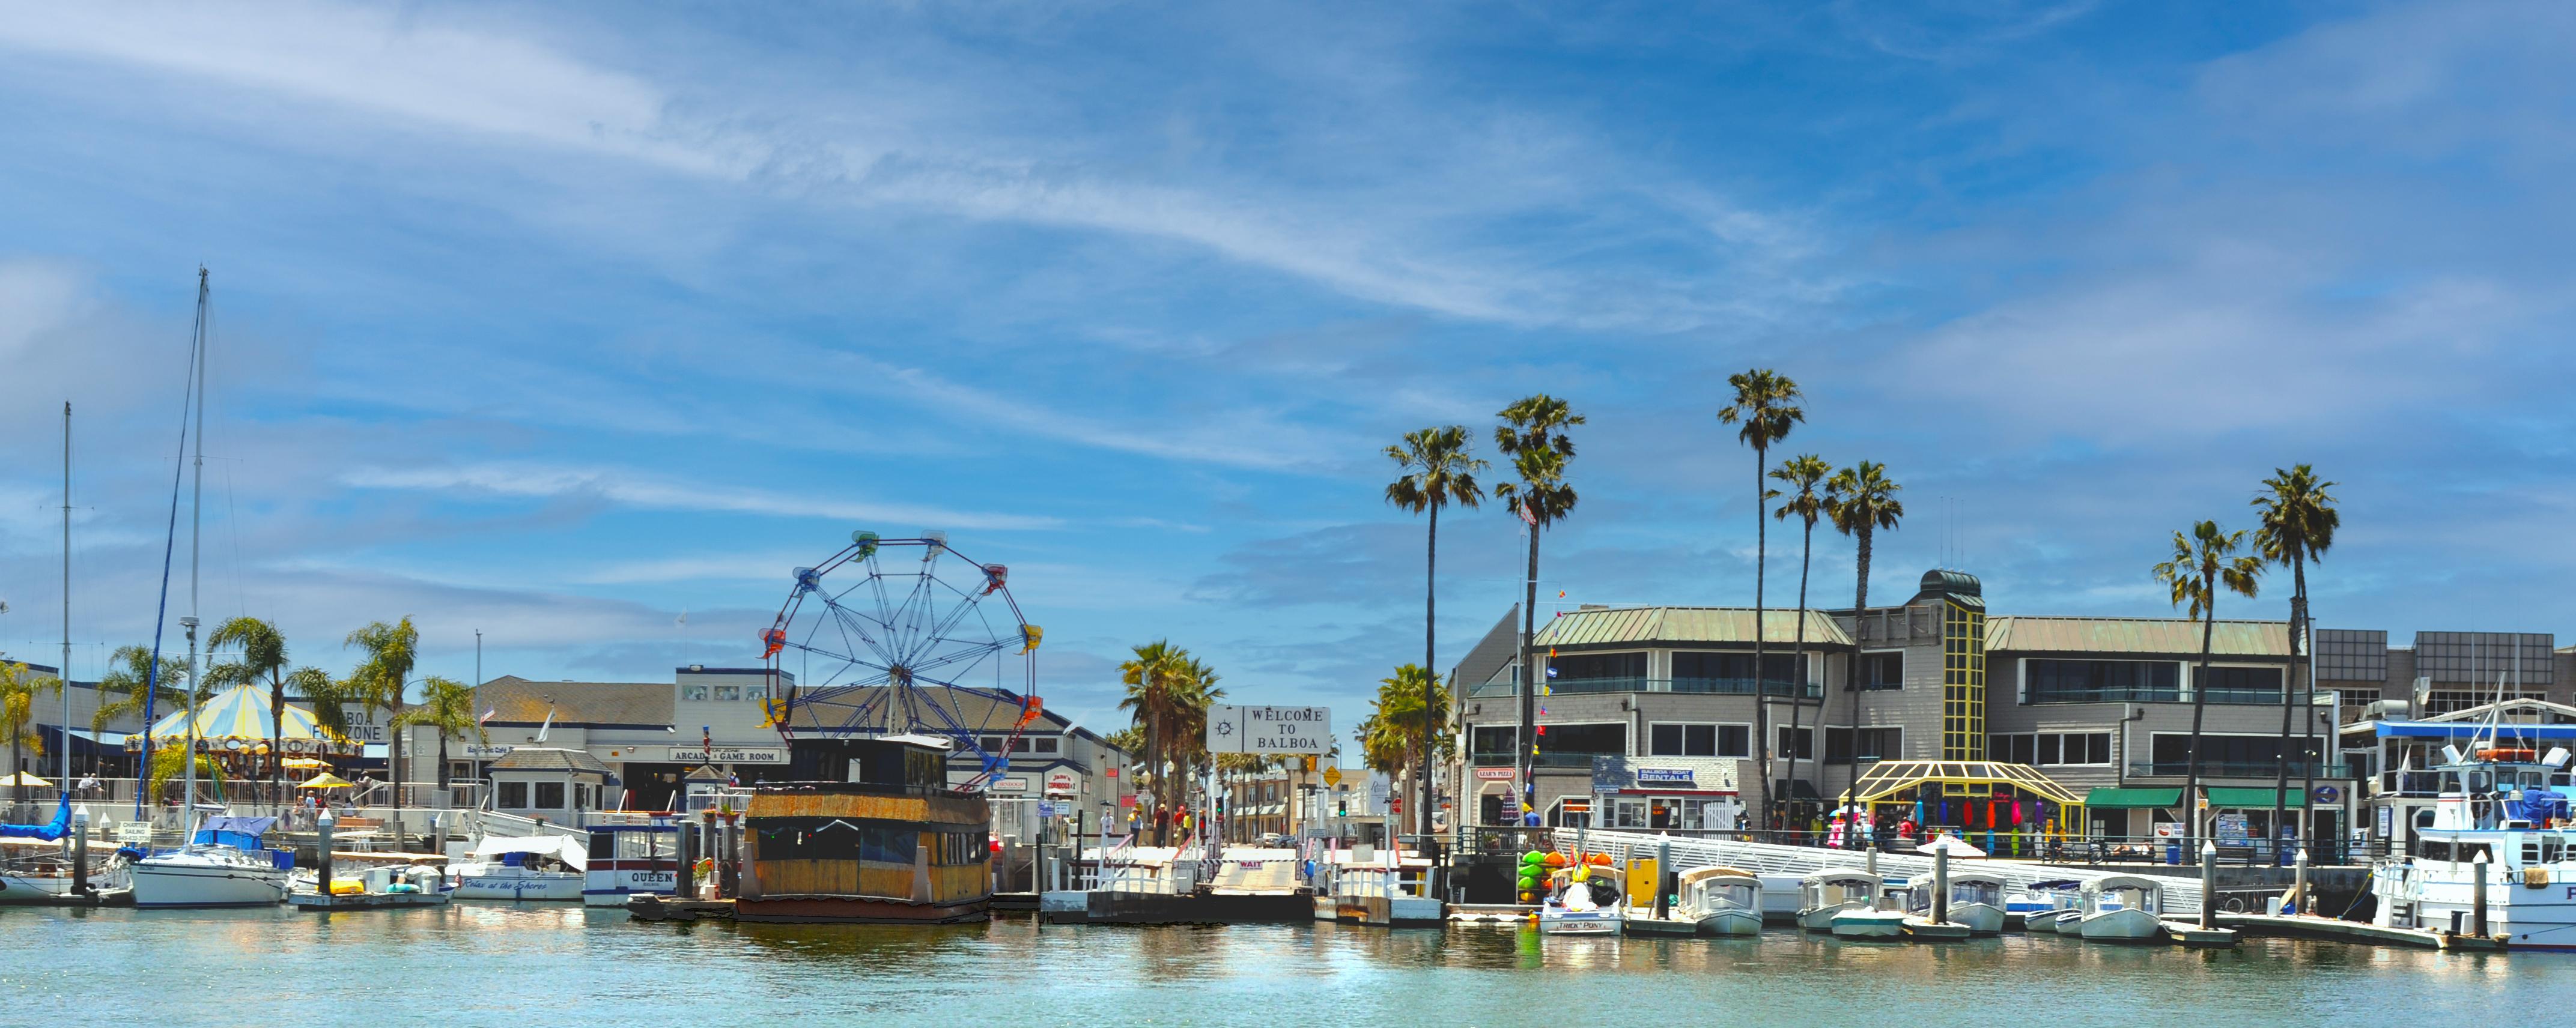 City Of Newport Beach Resolutions